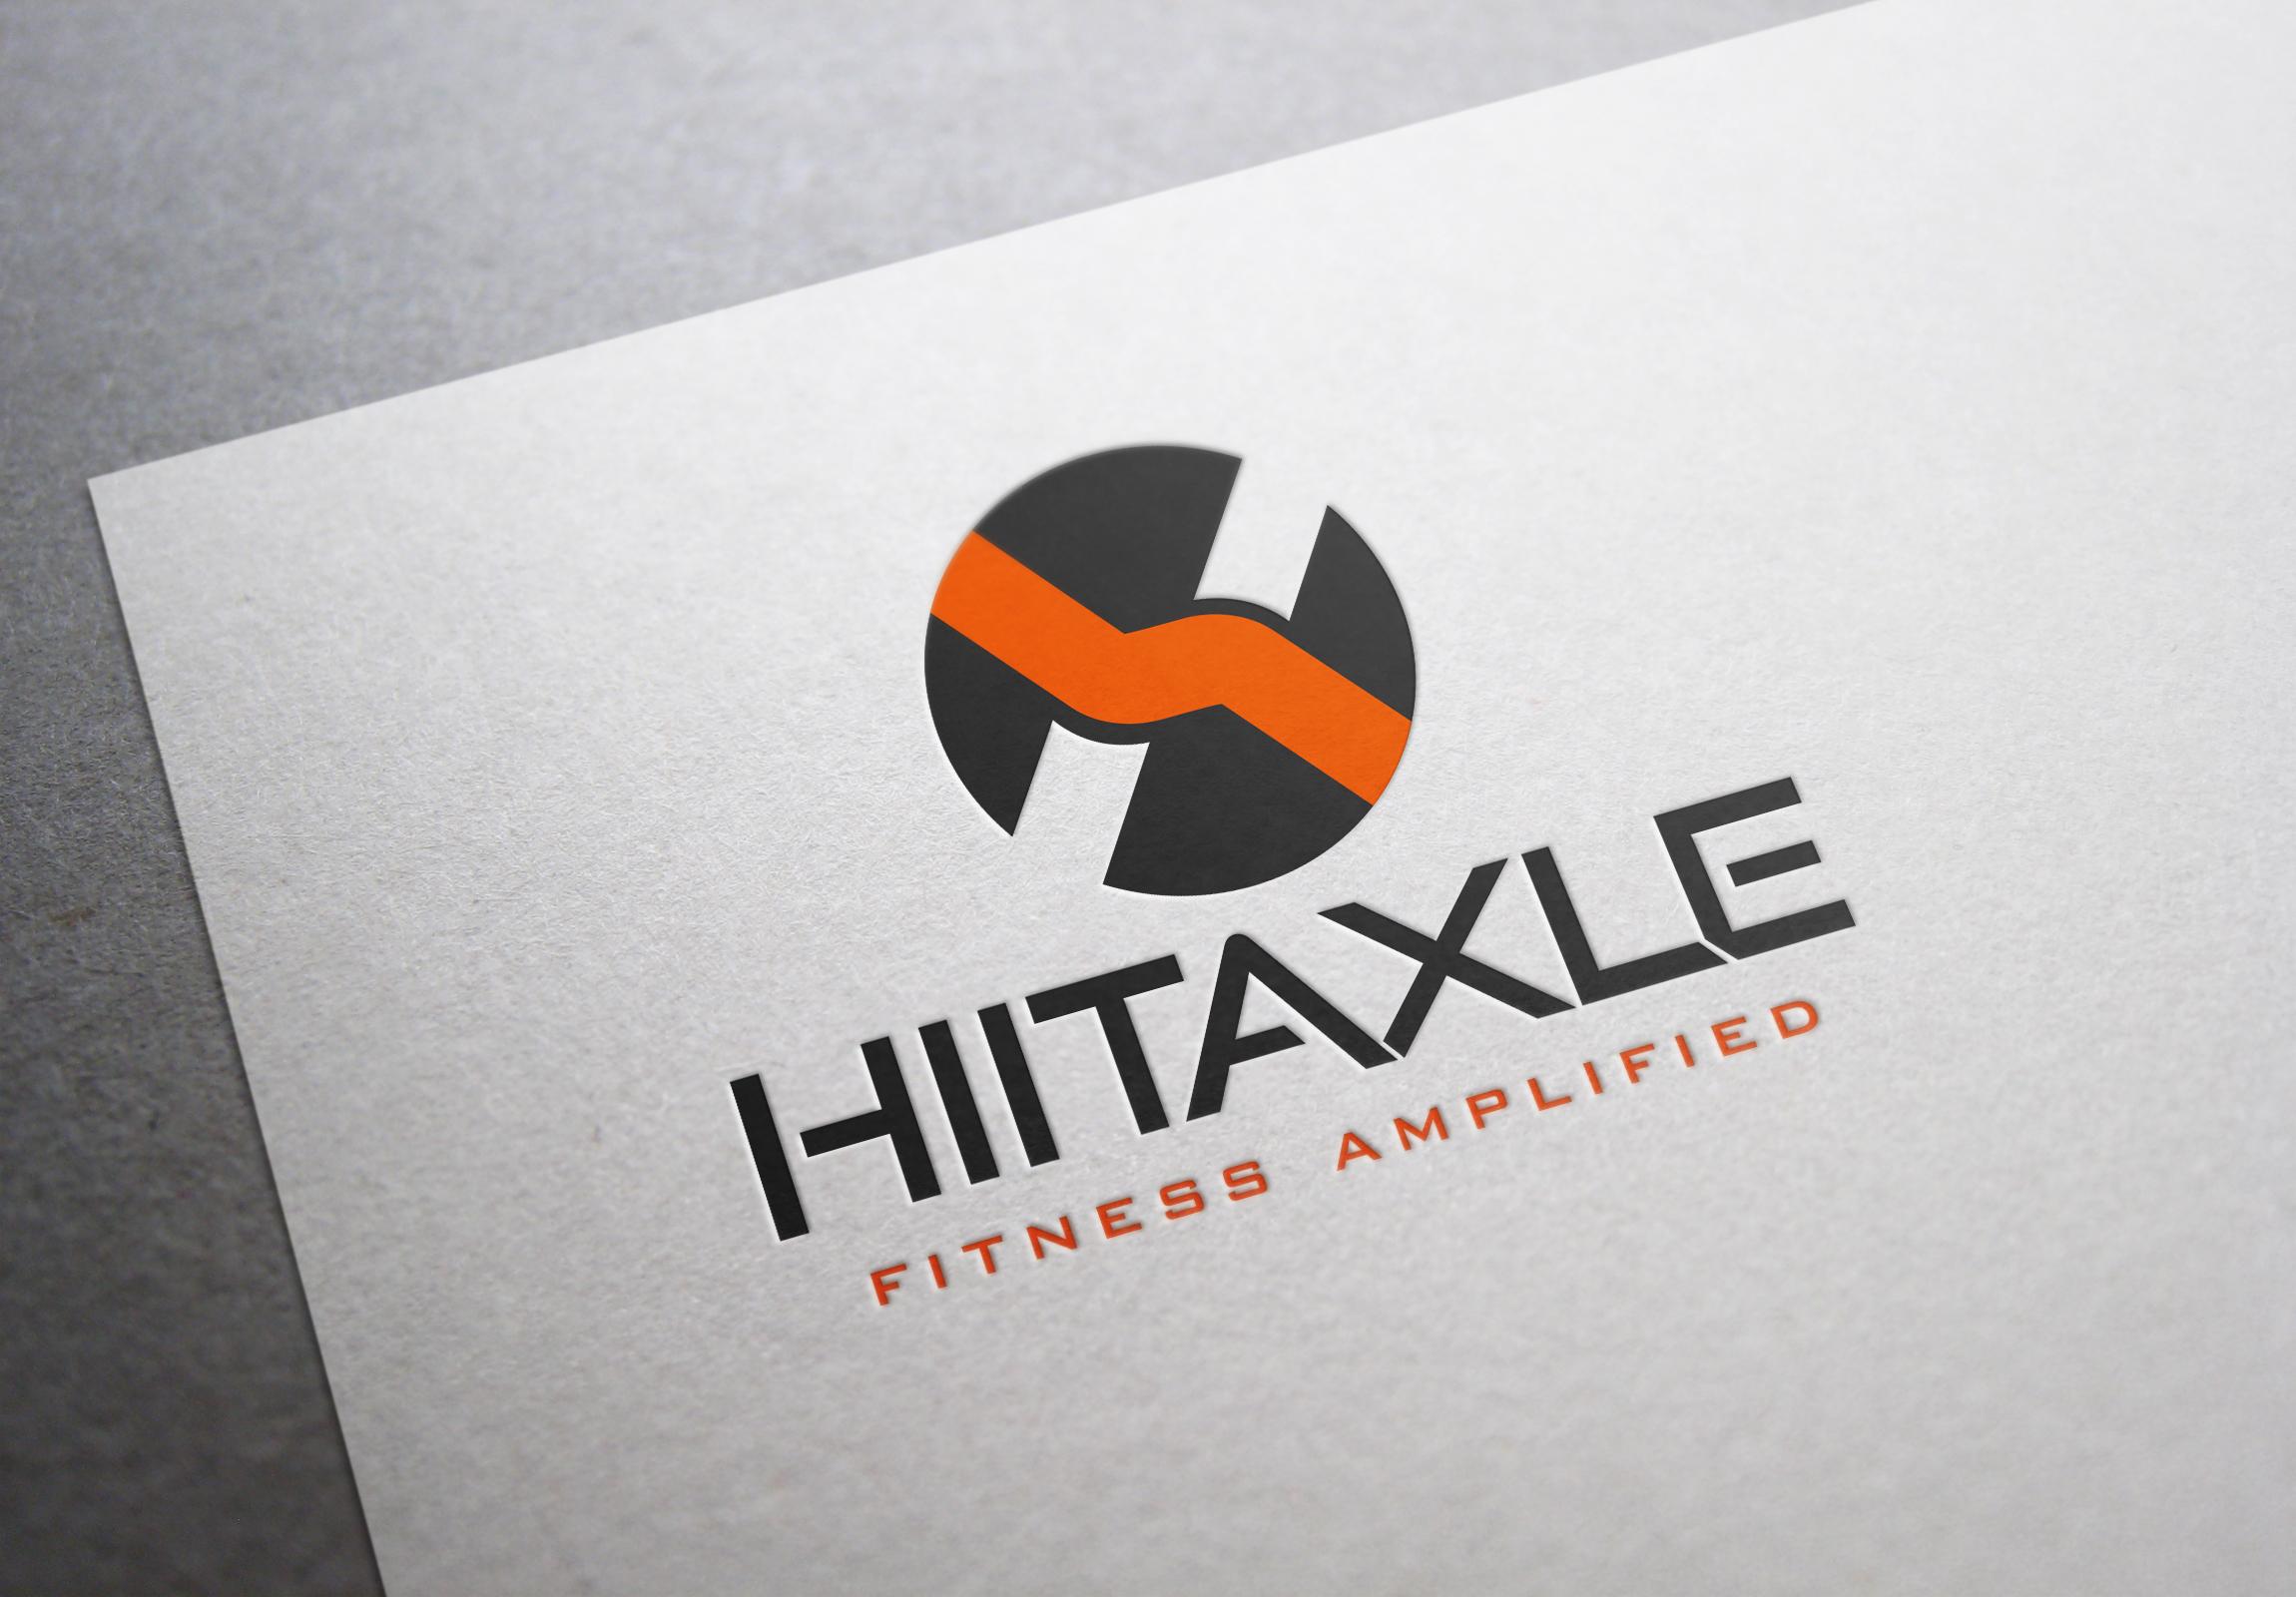 HIITAXLE Fitness Logo Los Angeles